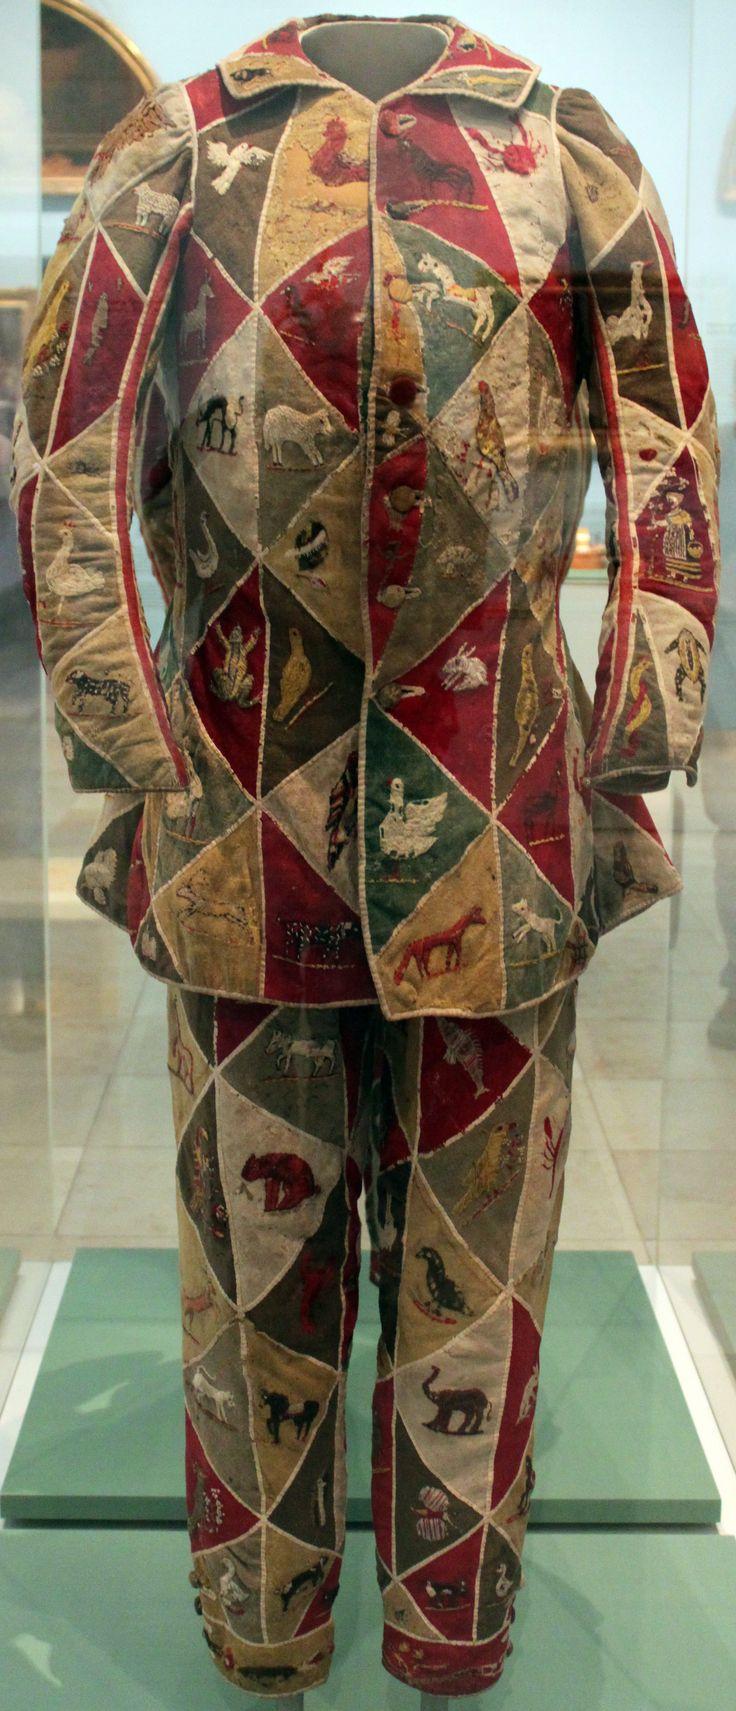 Costume of a Harlequin, 18th Century; Germanic National Museum in Nuremberg